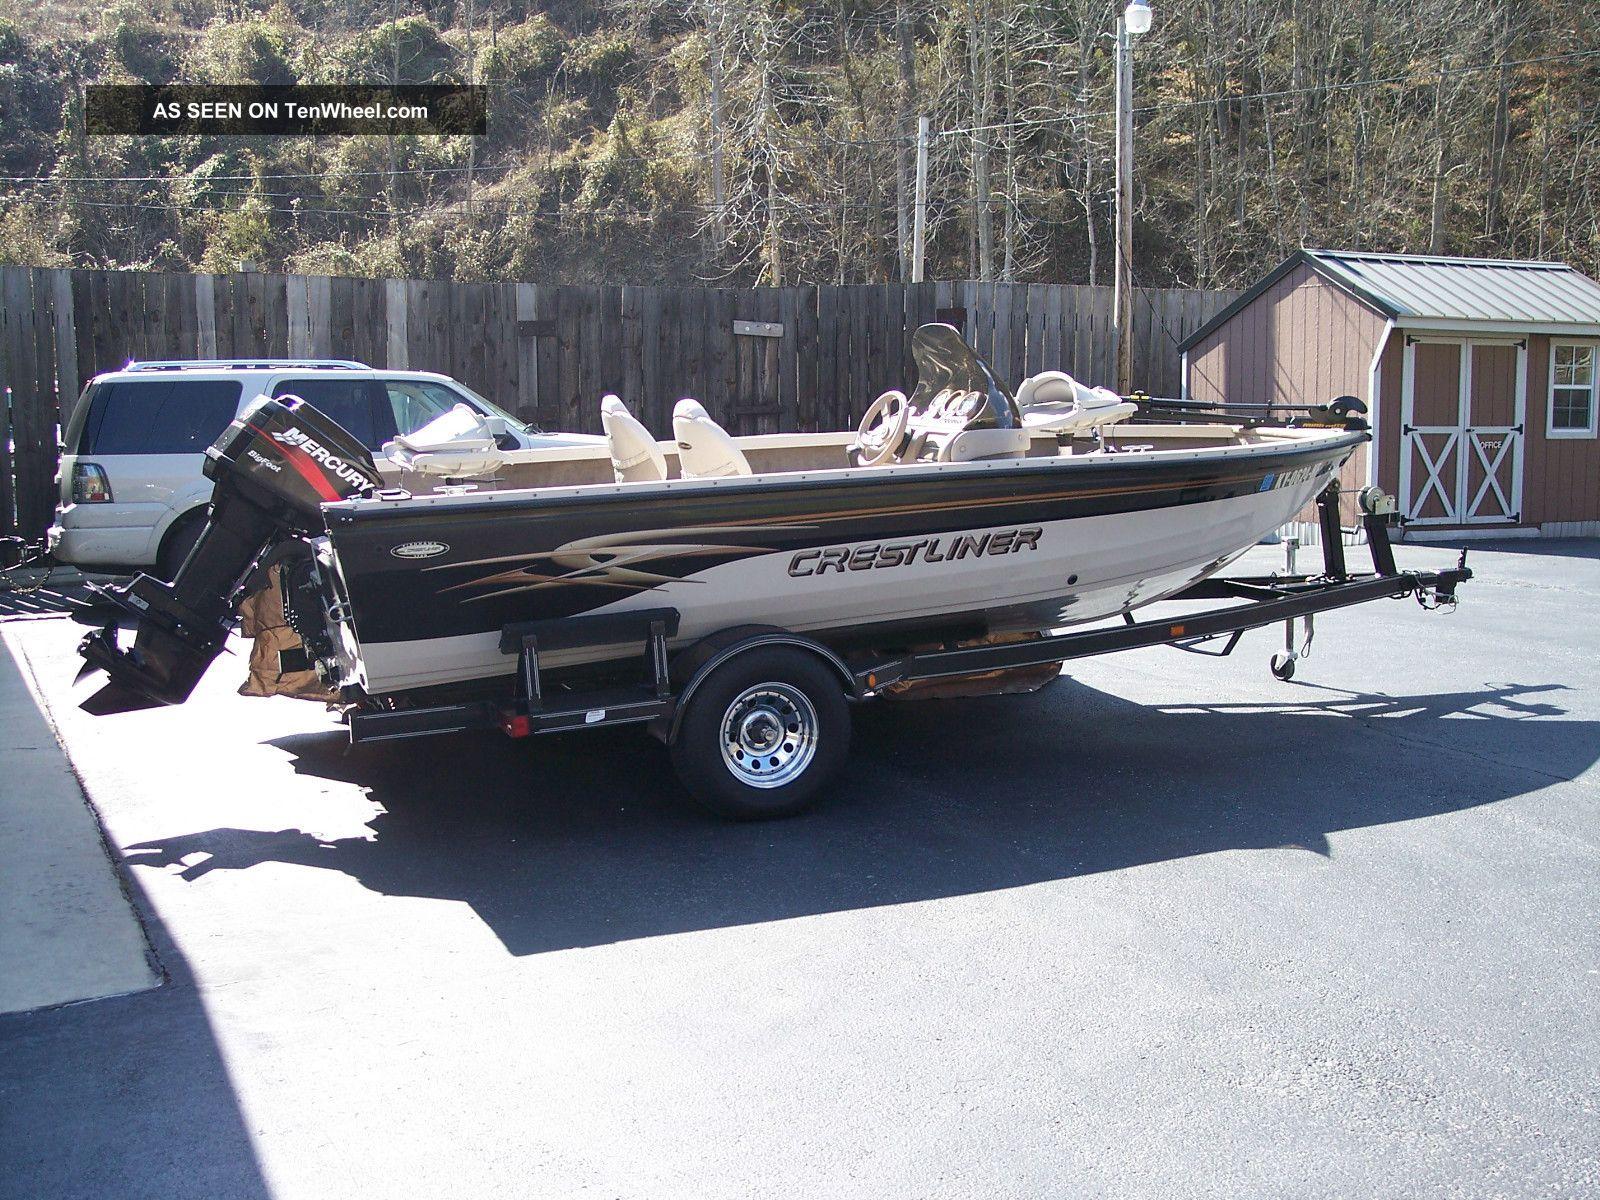 2002 Crestliner Fishhawk Bass Fishing Boats photo